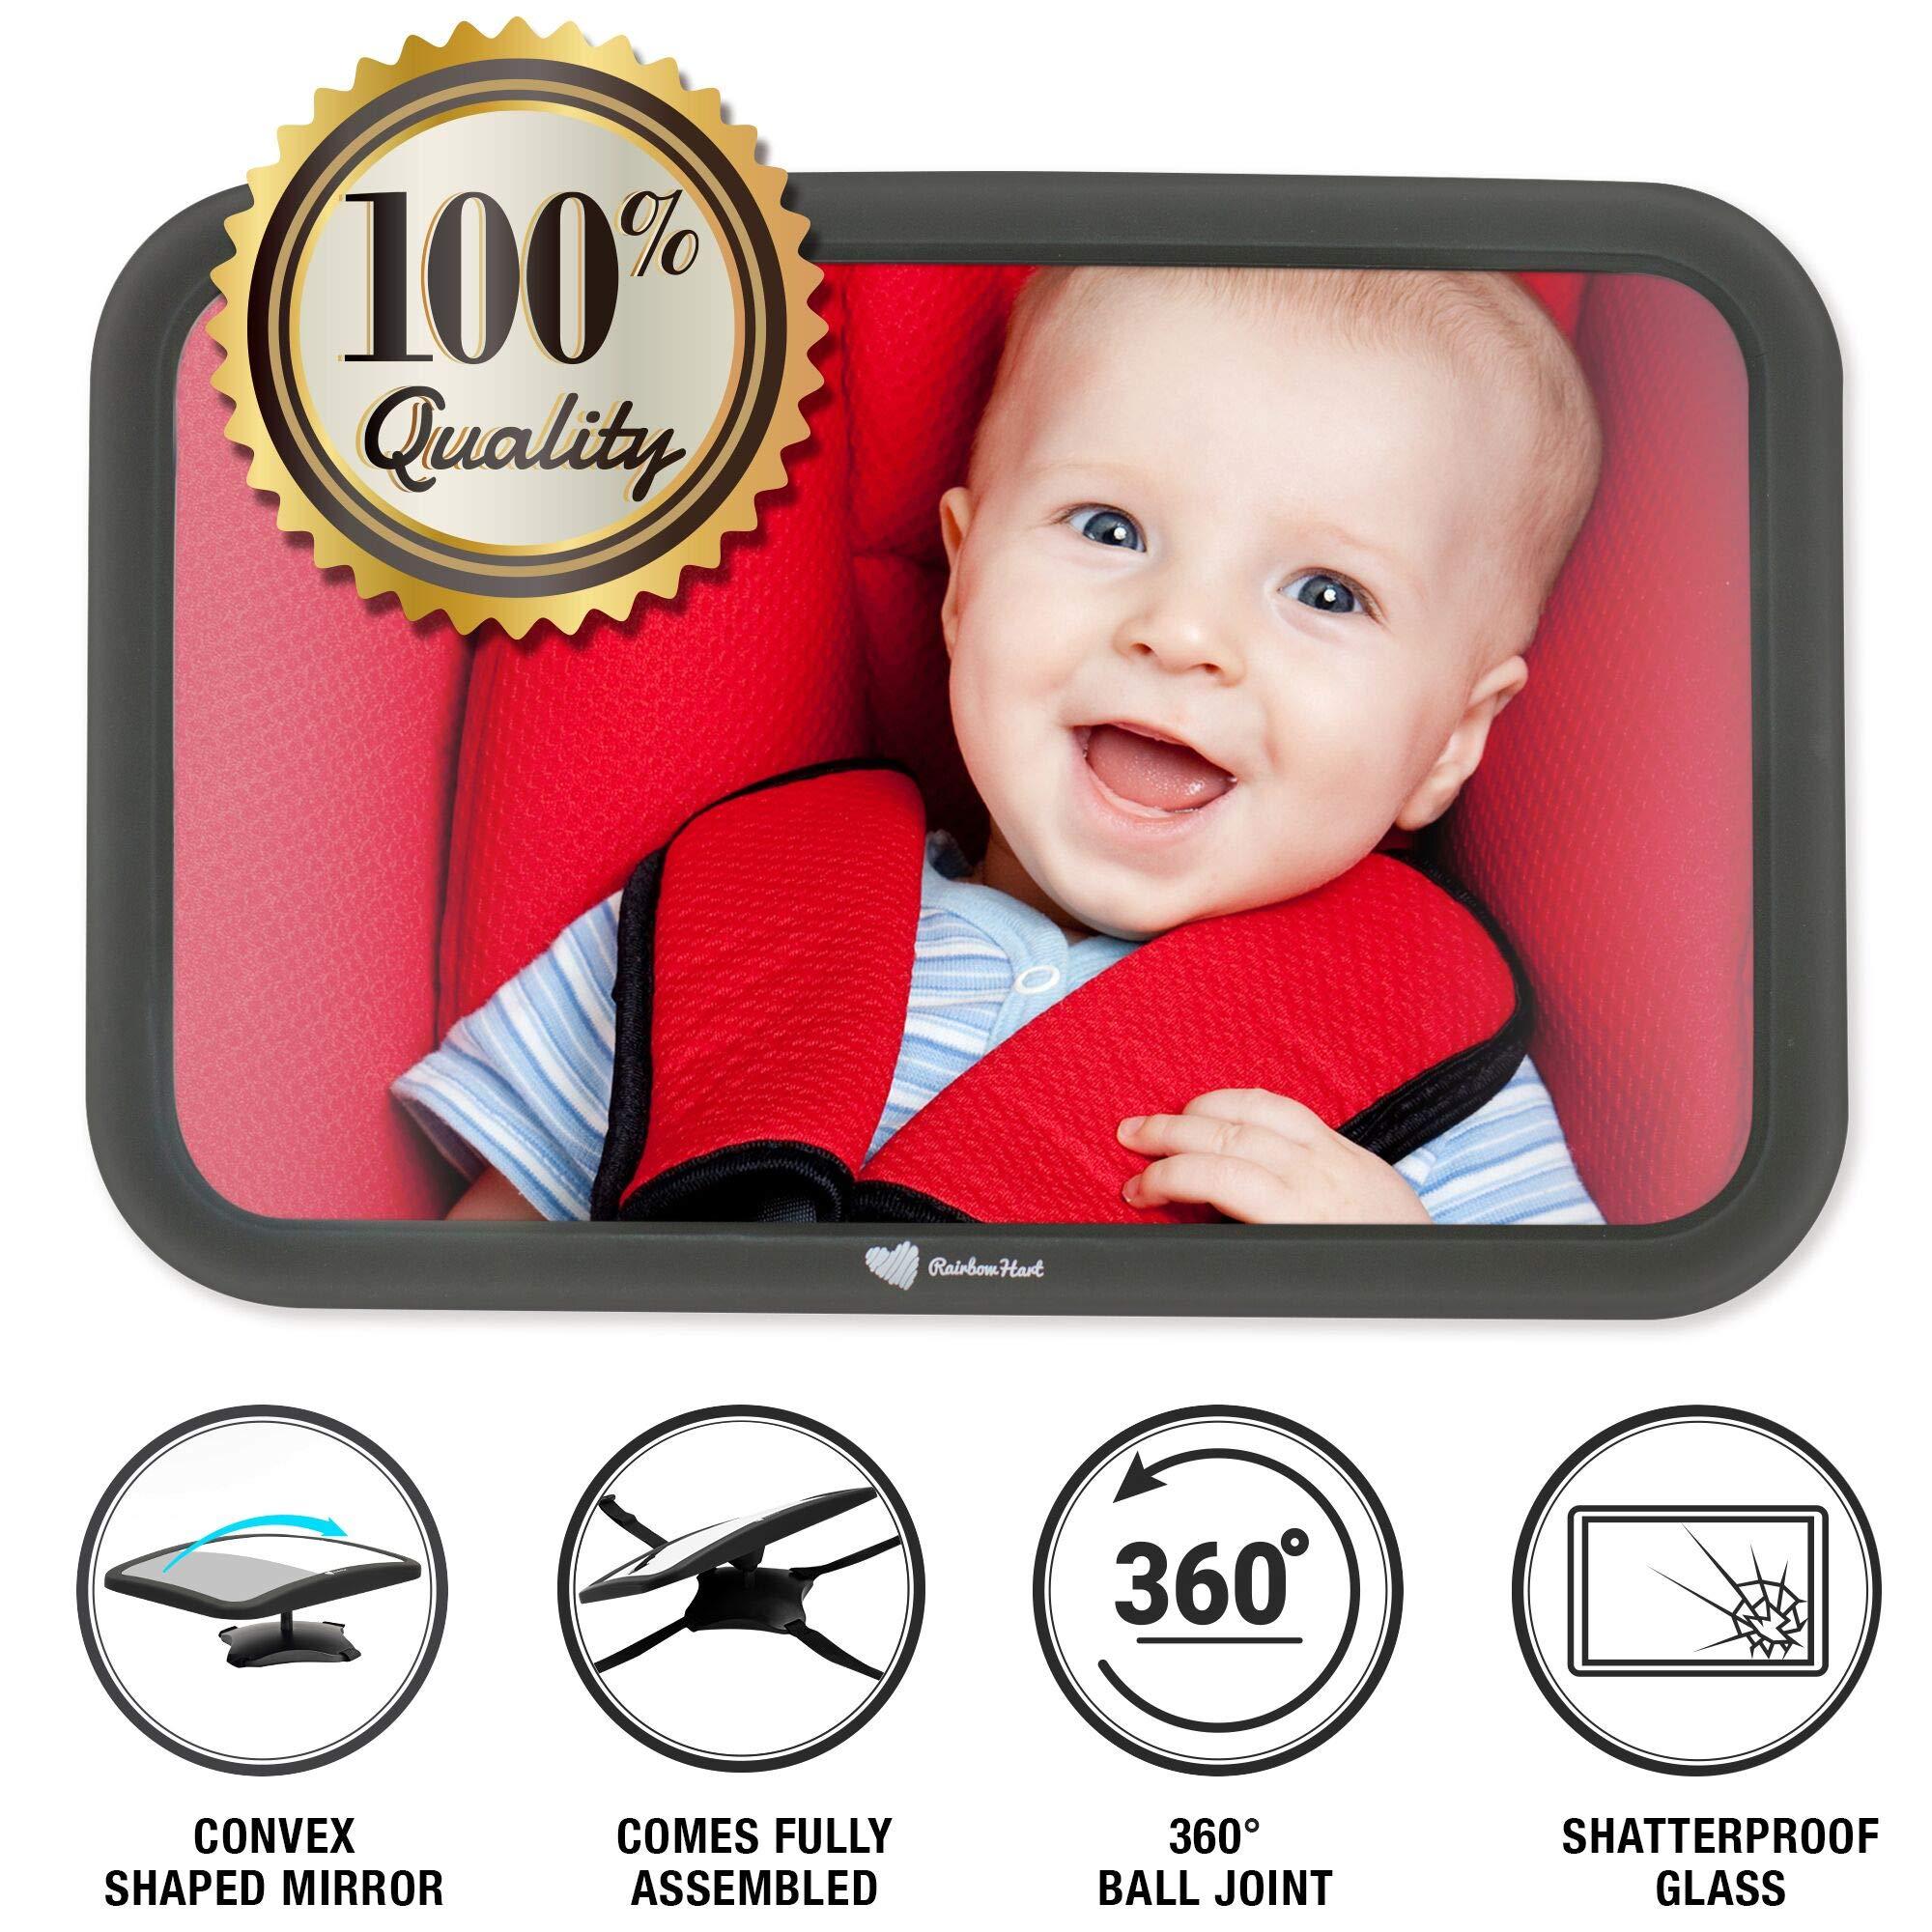 Rainbow Hart Baby Car Mirror for Back Seat - Mirror for Car Seat Rear Facing by Rainbow Hart